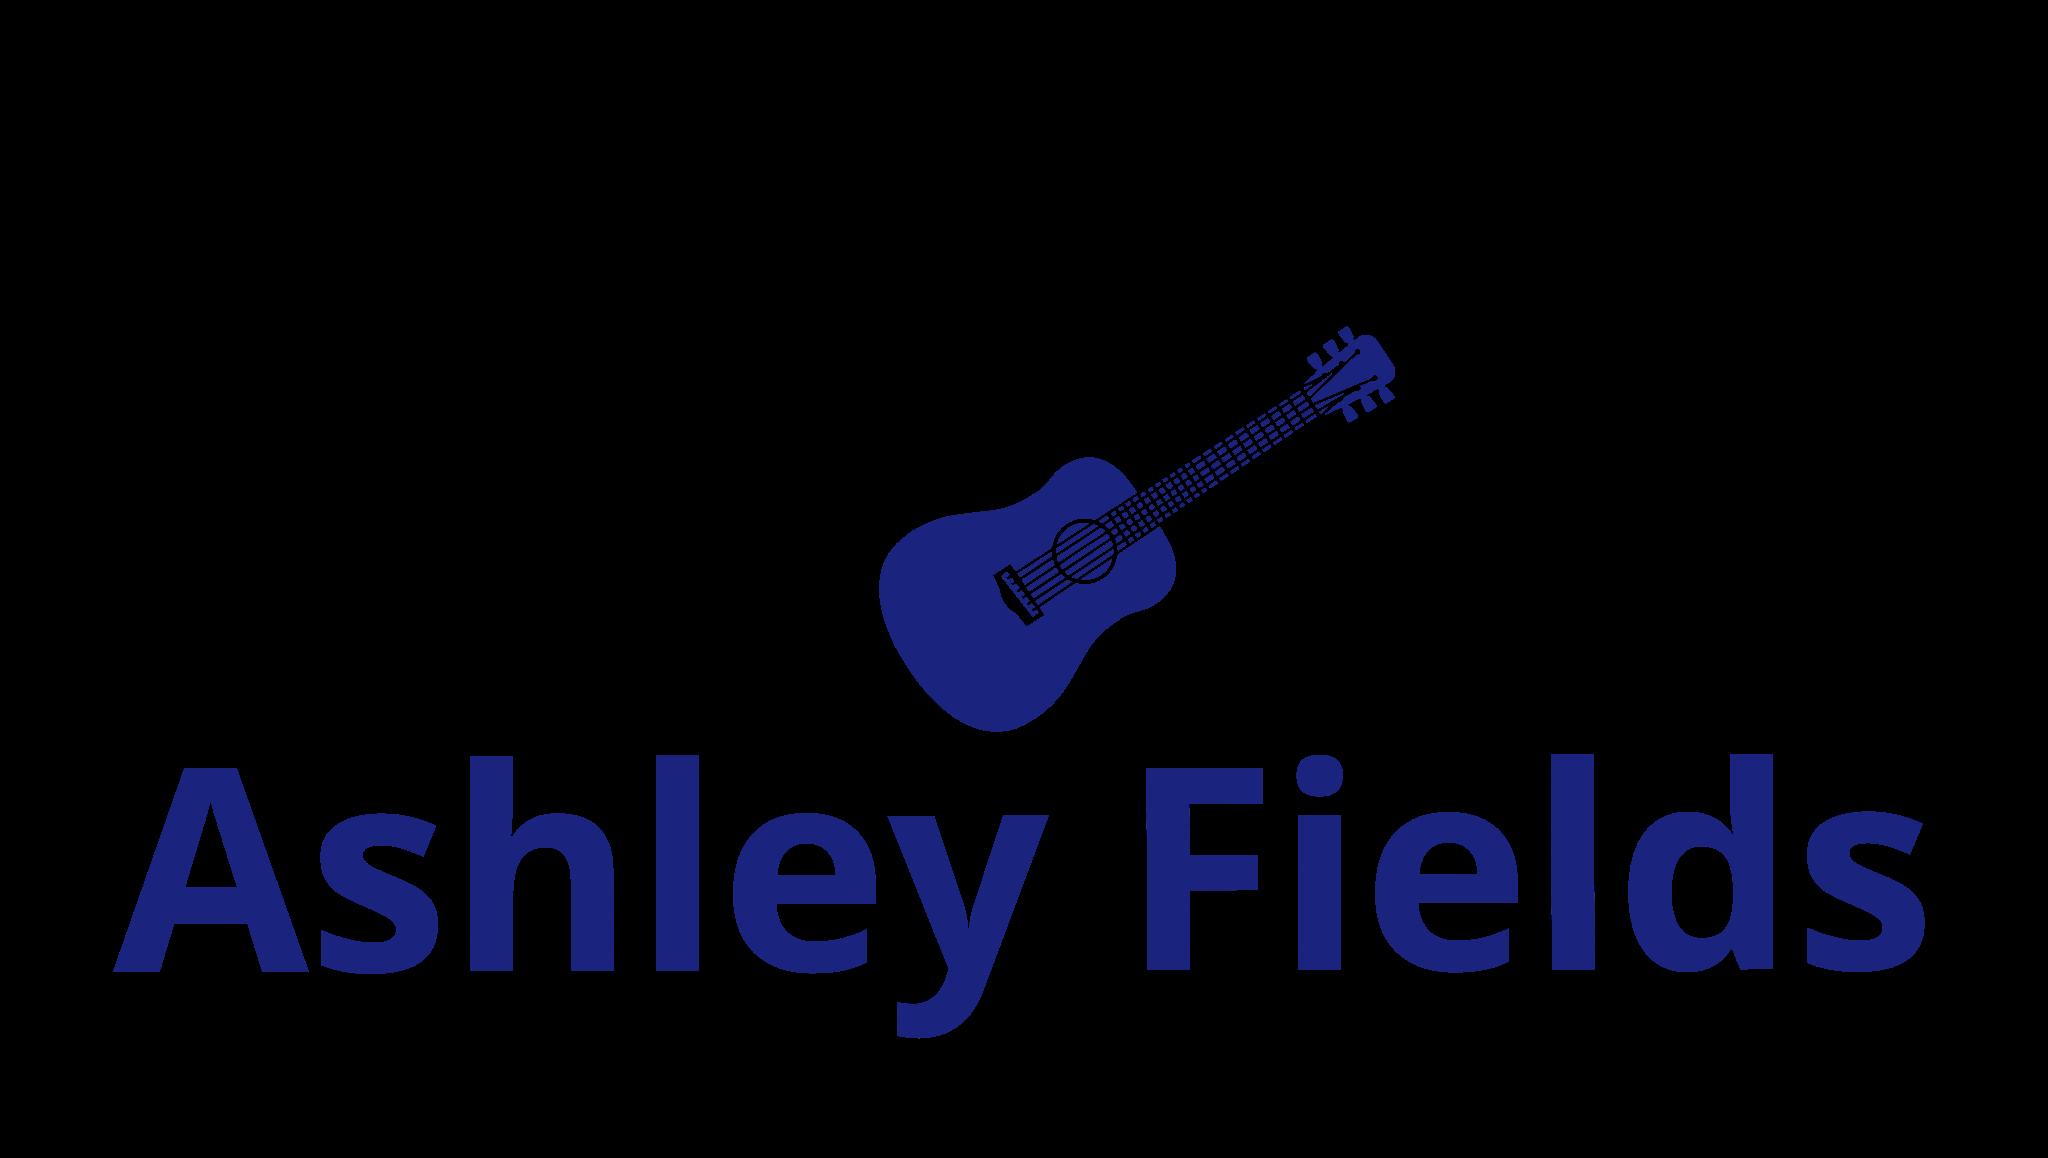 Ashley Fields Music